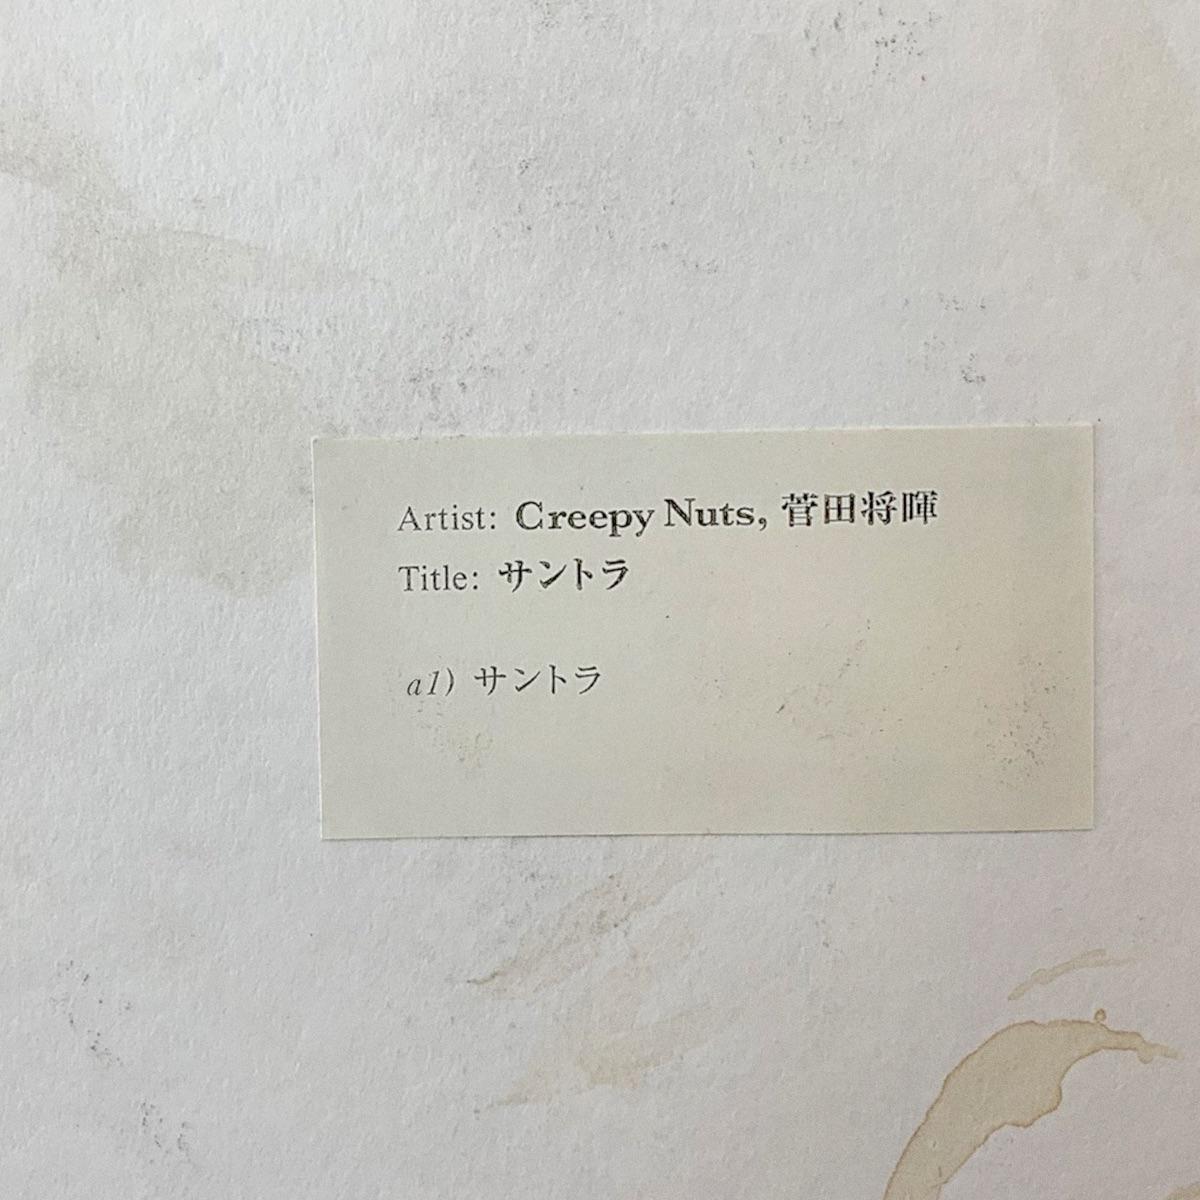 『Creepy Nuts×菅田将暉 - サントラ』収録の『サントラ』ジャケット